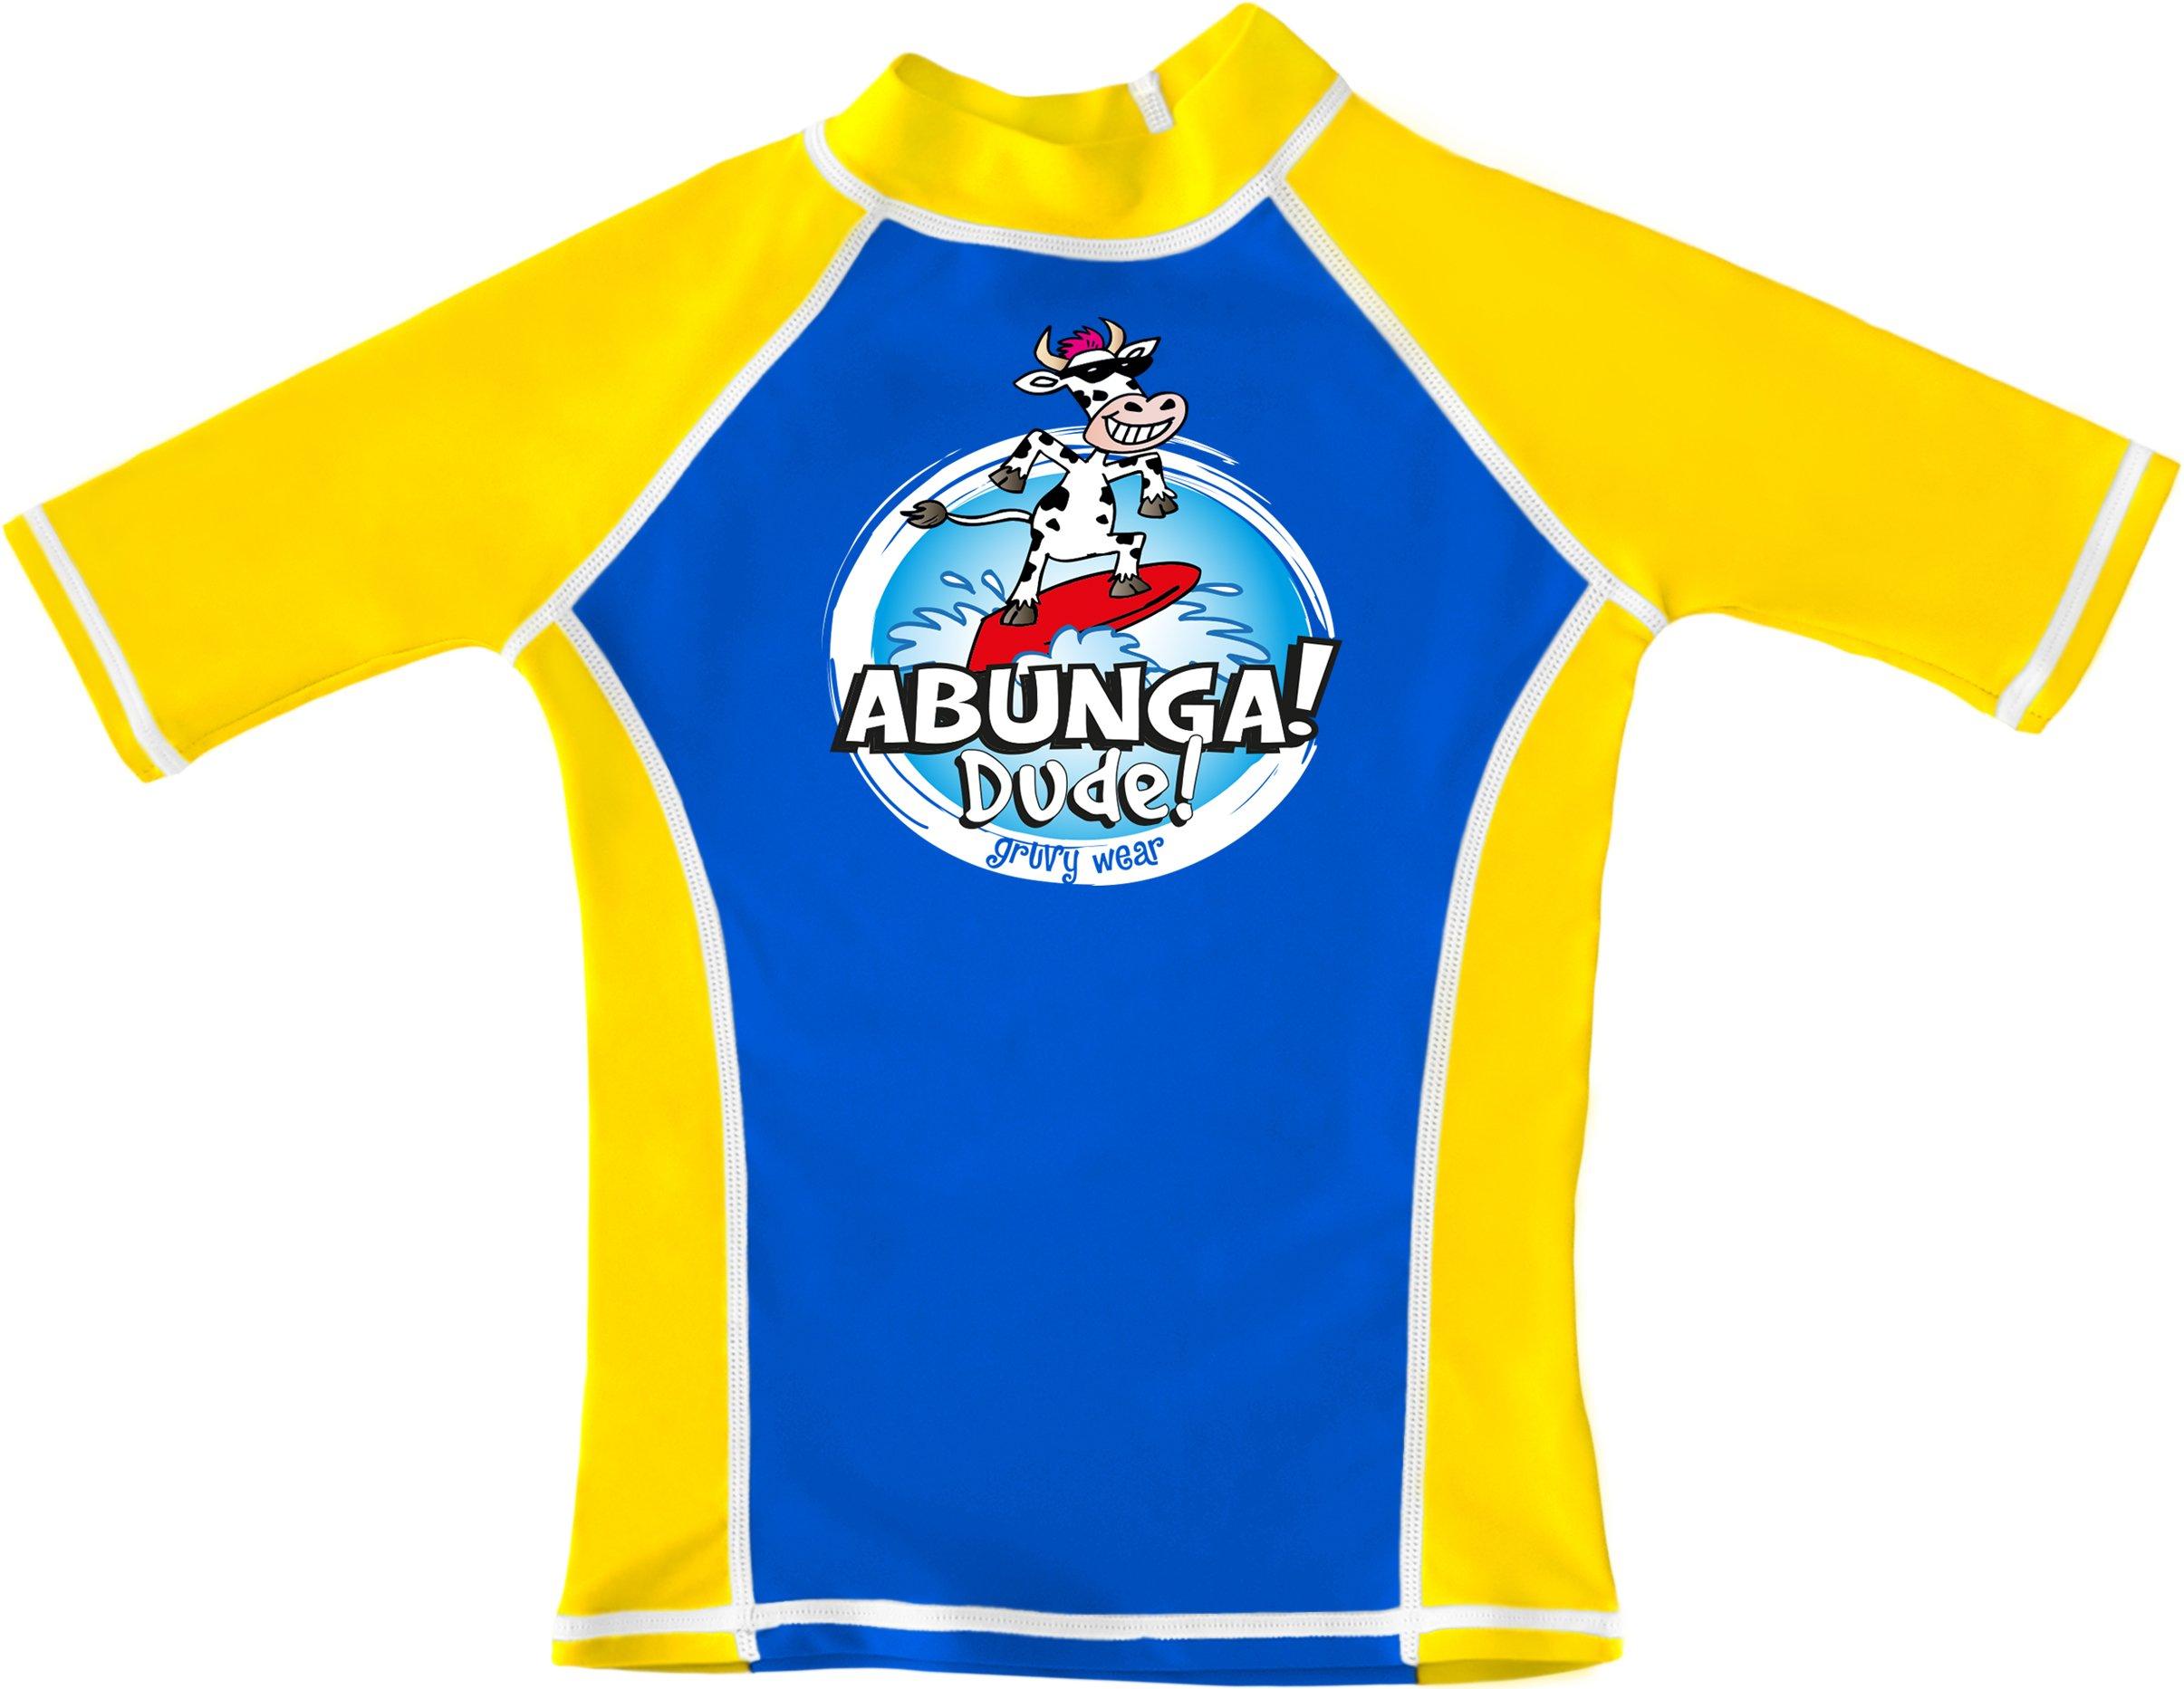 91f9957b3e541 grUVywear Boys UV Sun Protective Surf Rashguard Short Sleeve Swim Shirt UPF  50+ (Royal Blue Yellow, M 7-8)